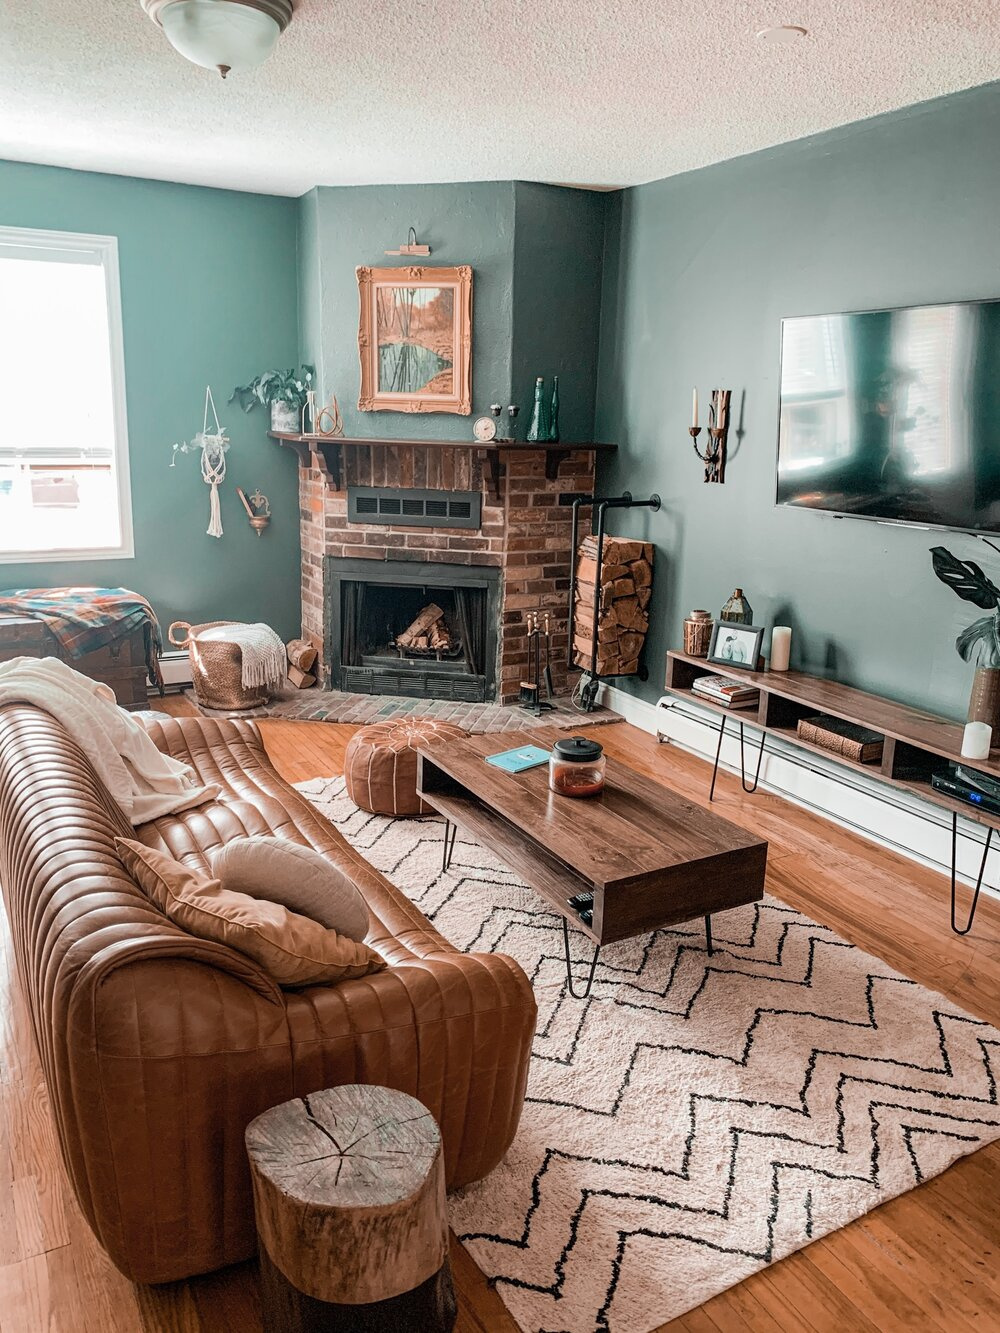 Cheap Diy Home Decor Crafts from images.squarespace-cdn.com